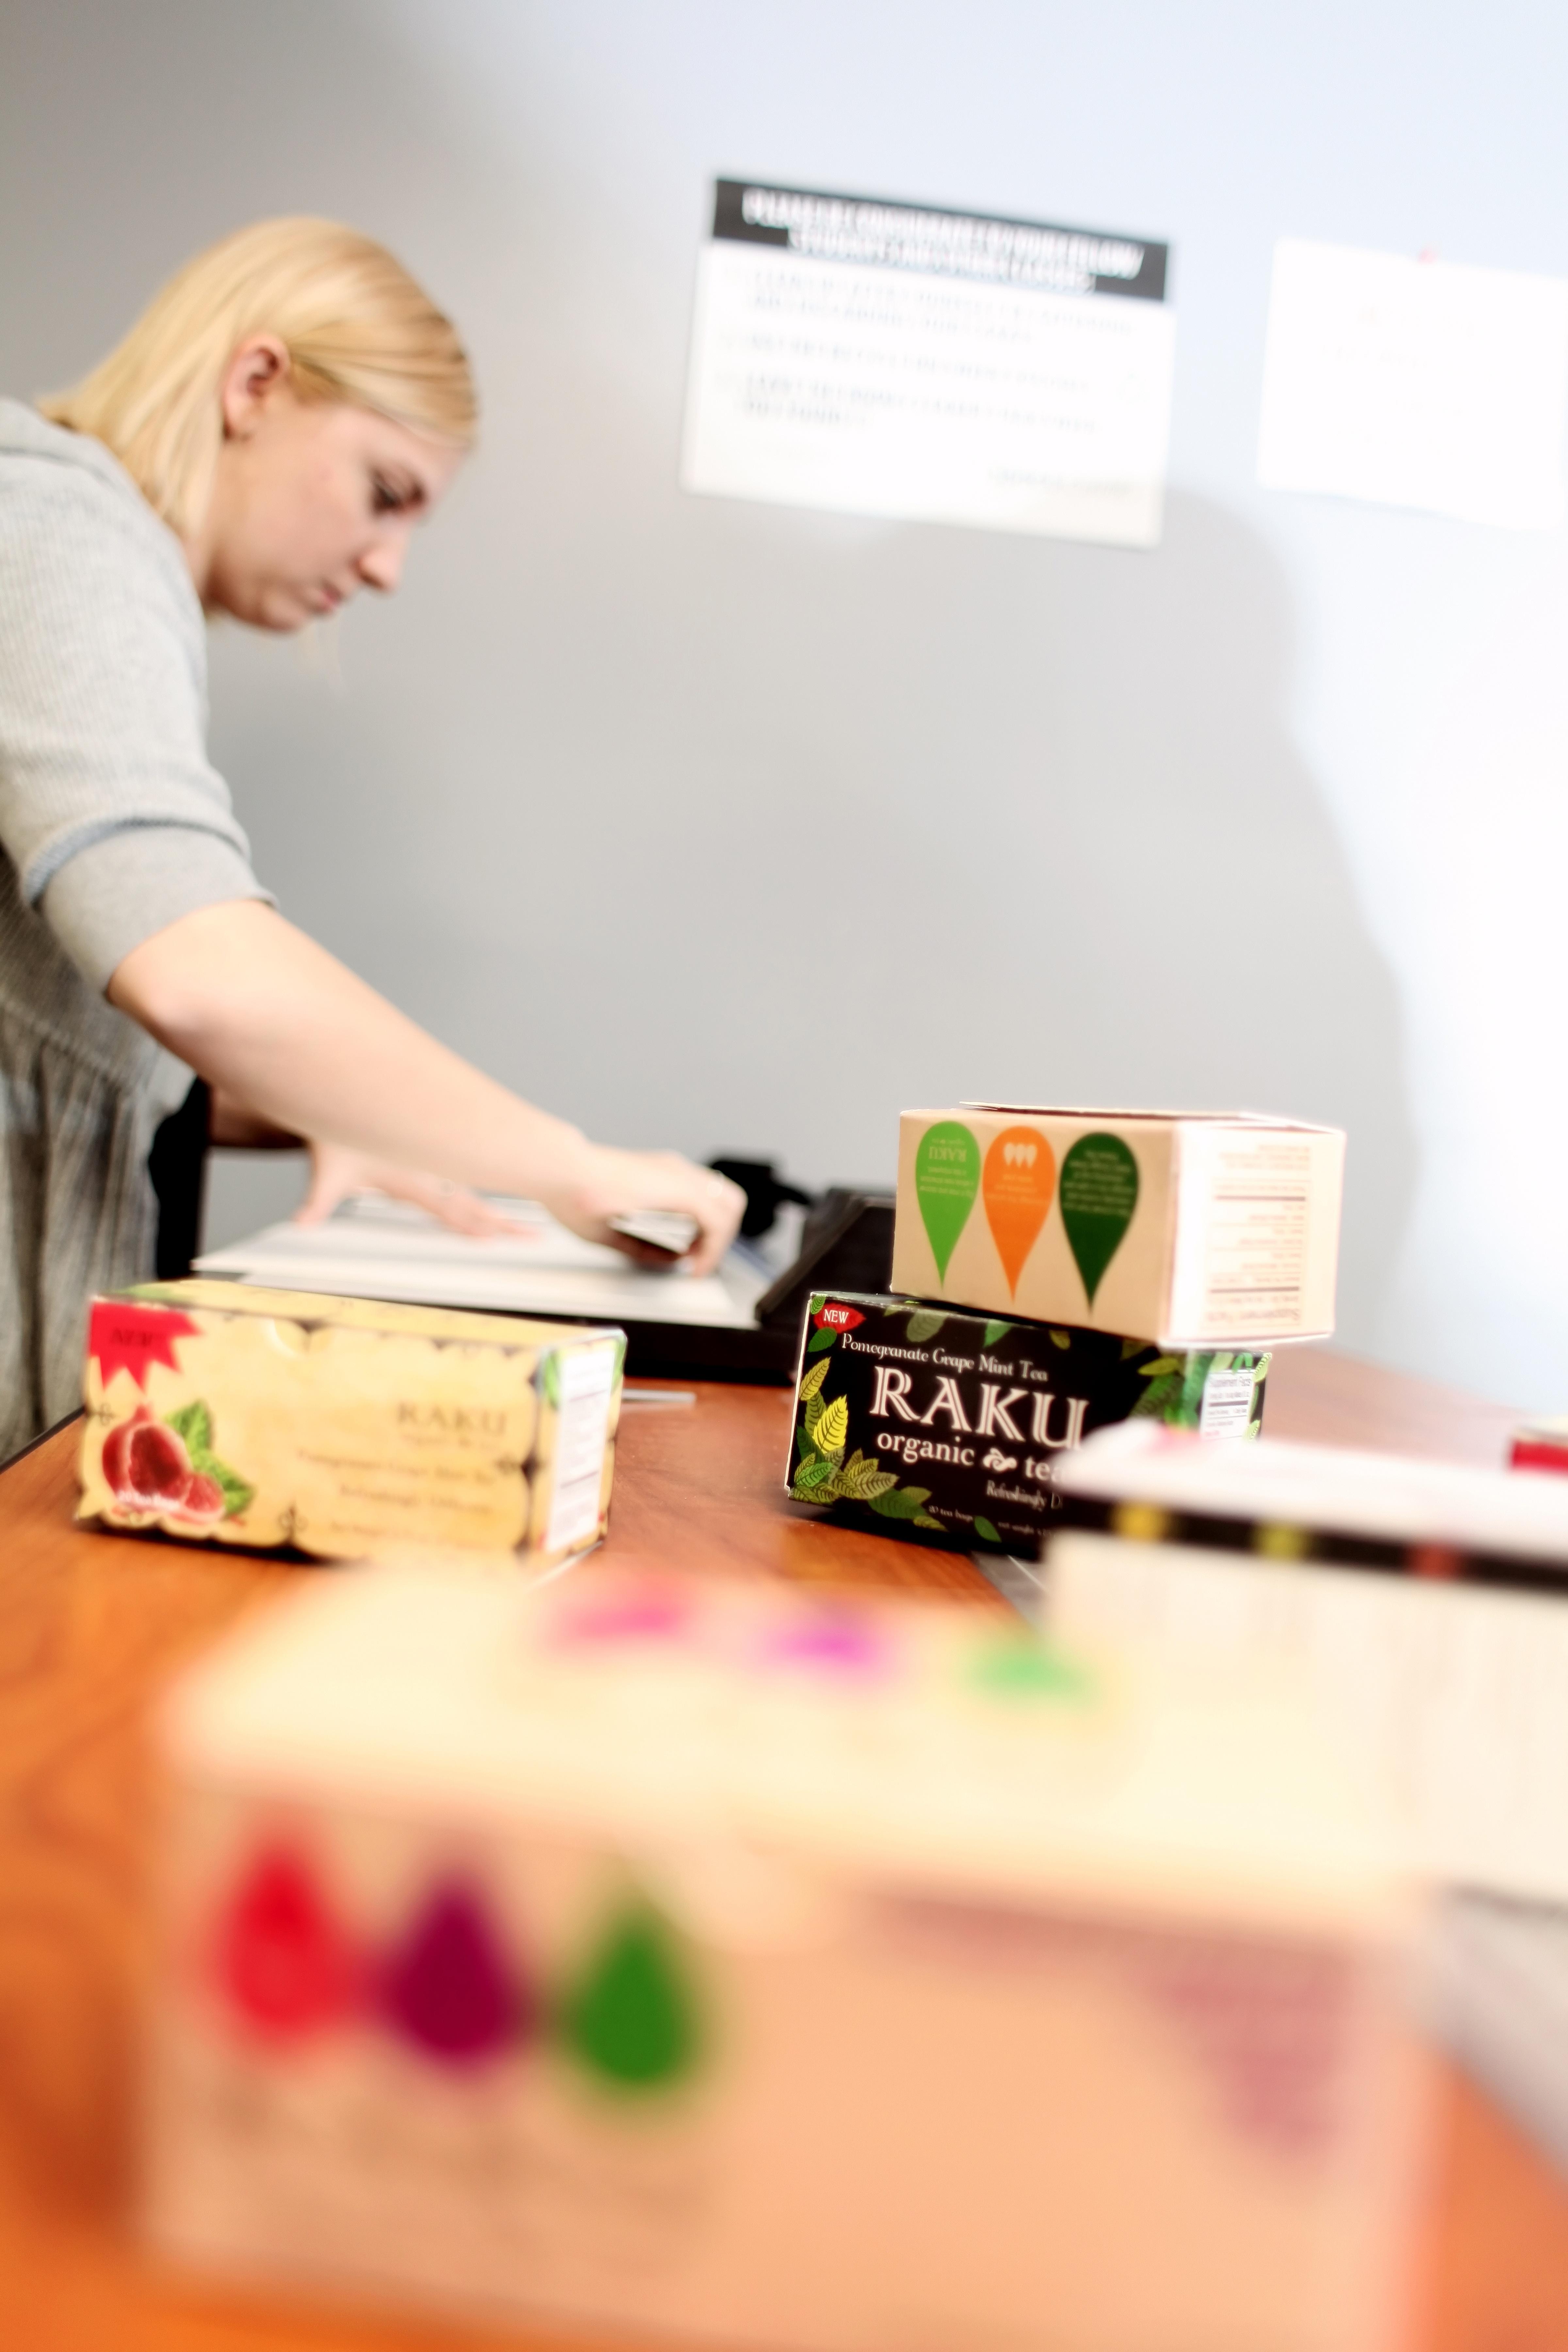 2012 Graphic Design Student working in Matte Room.jpg